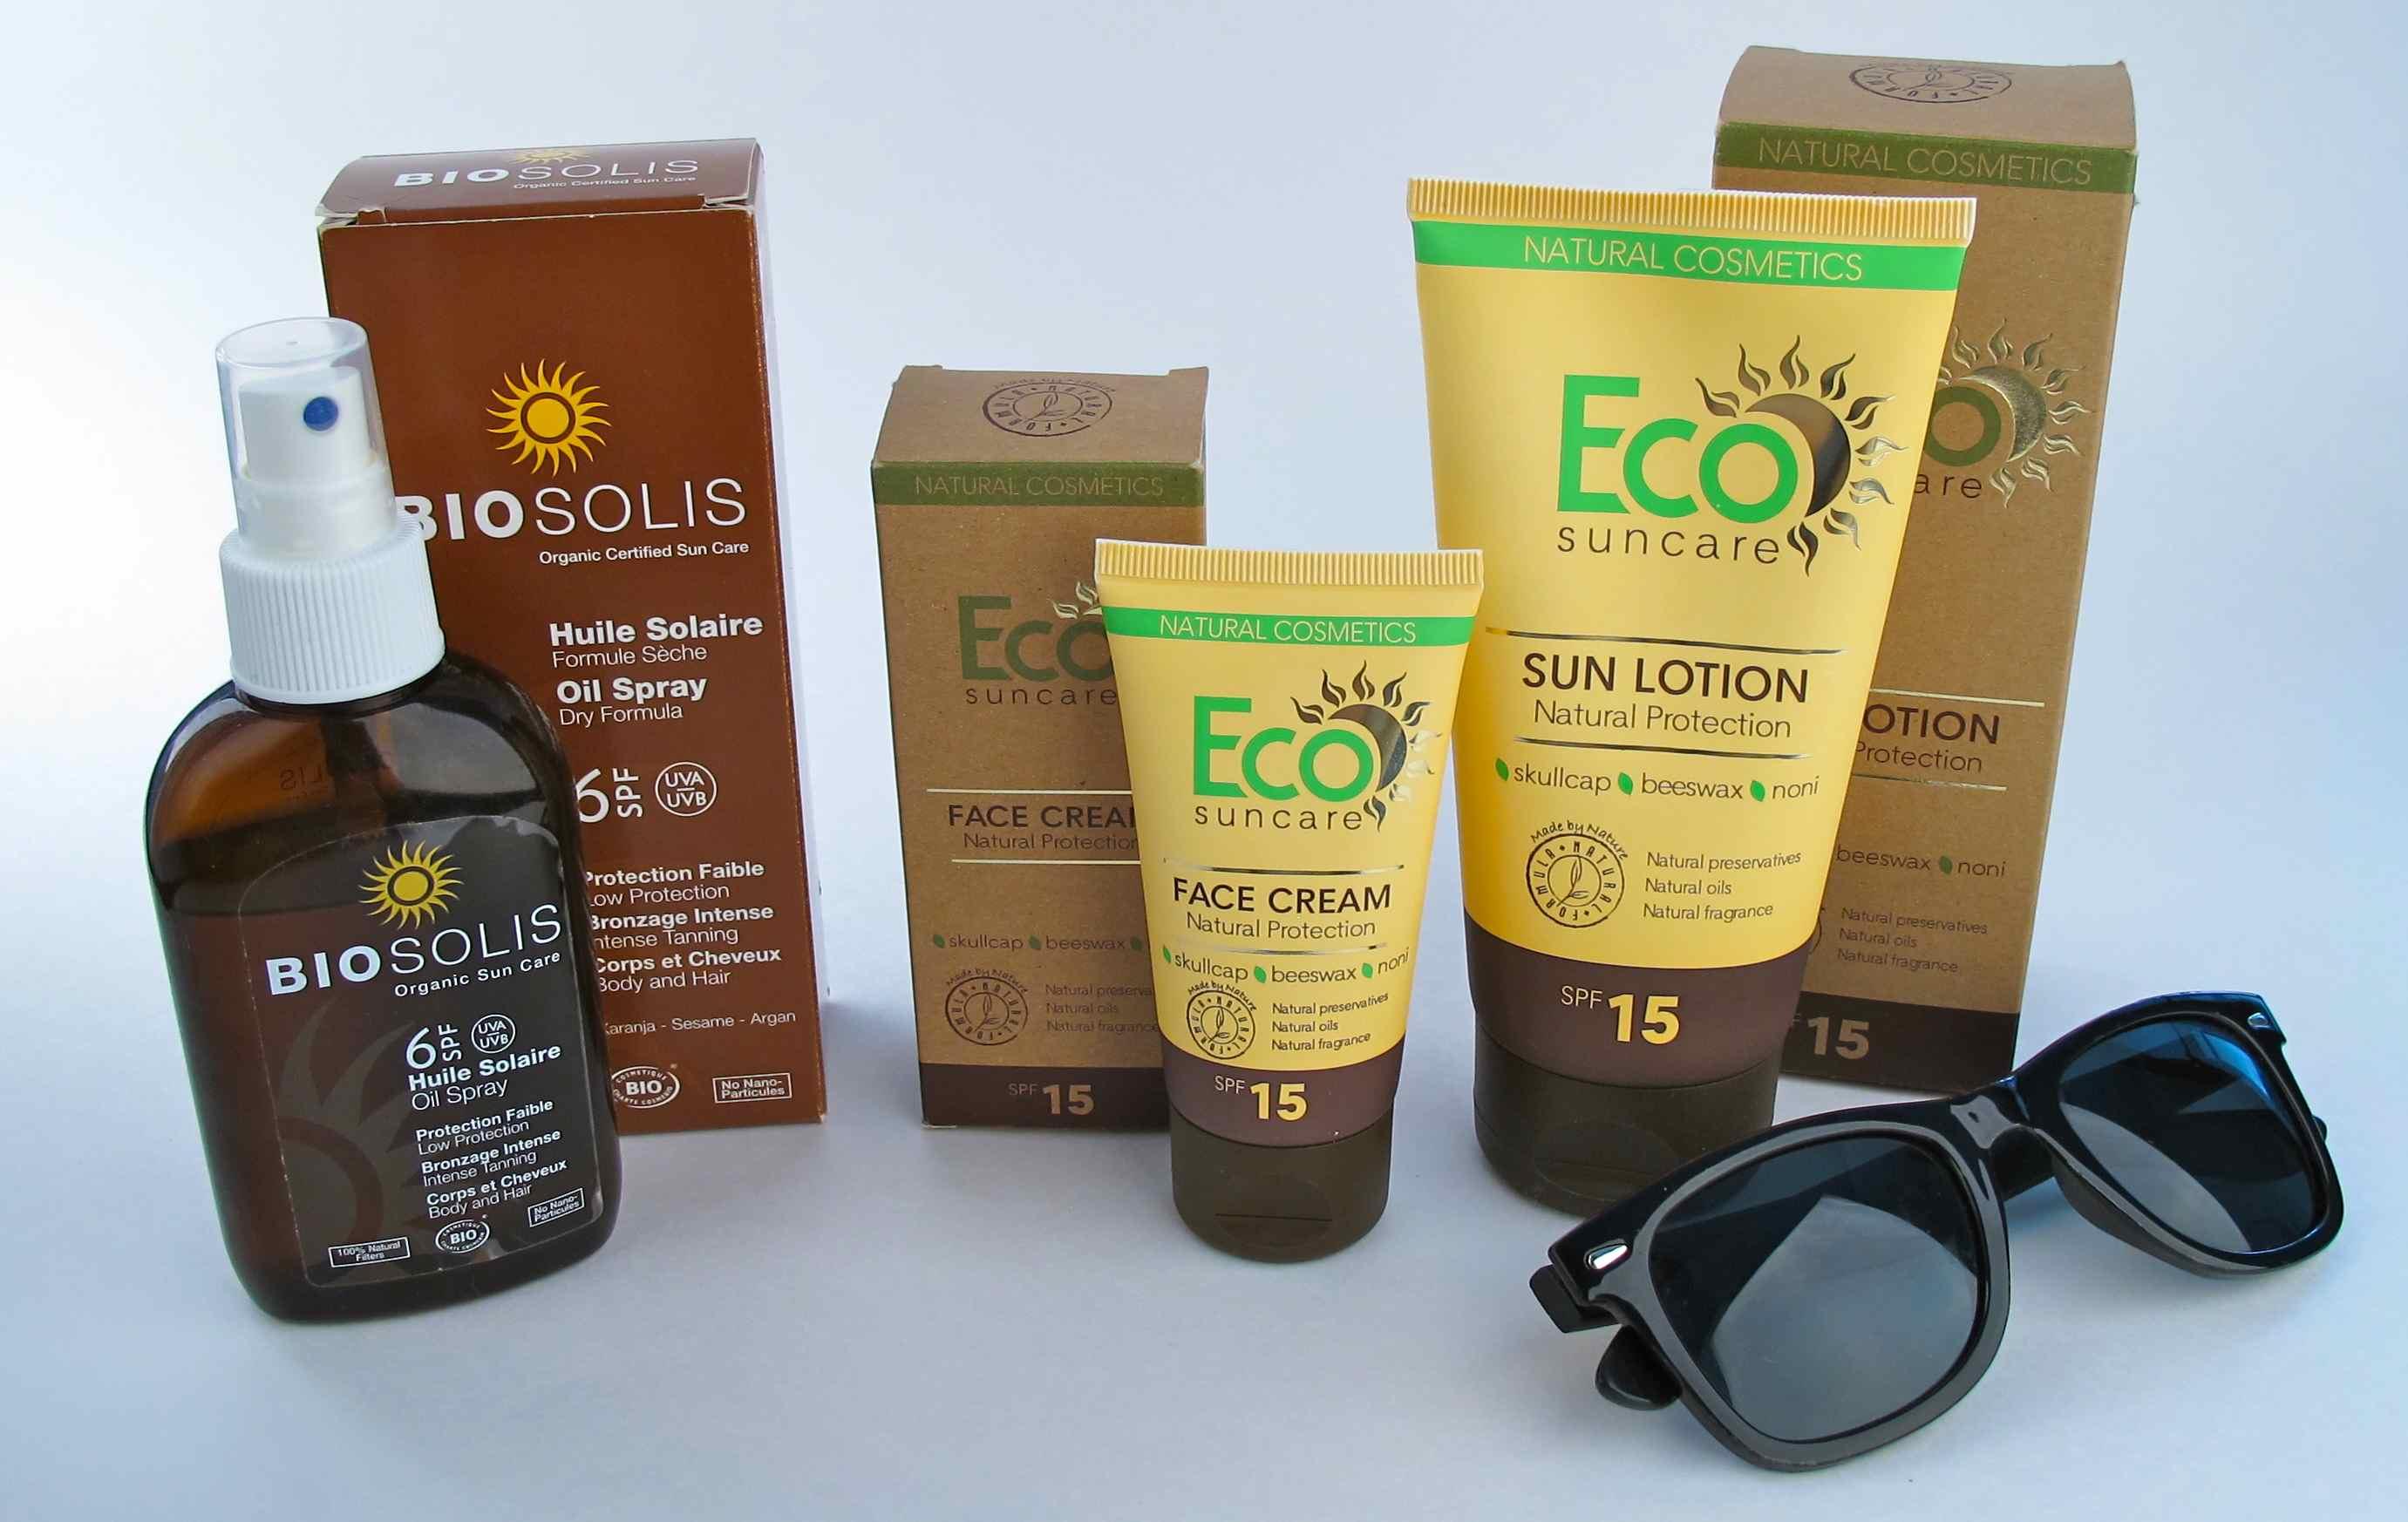 Eco suncare biosolis products